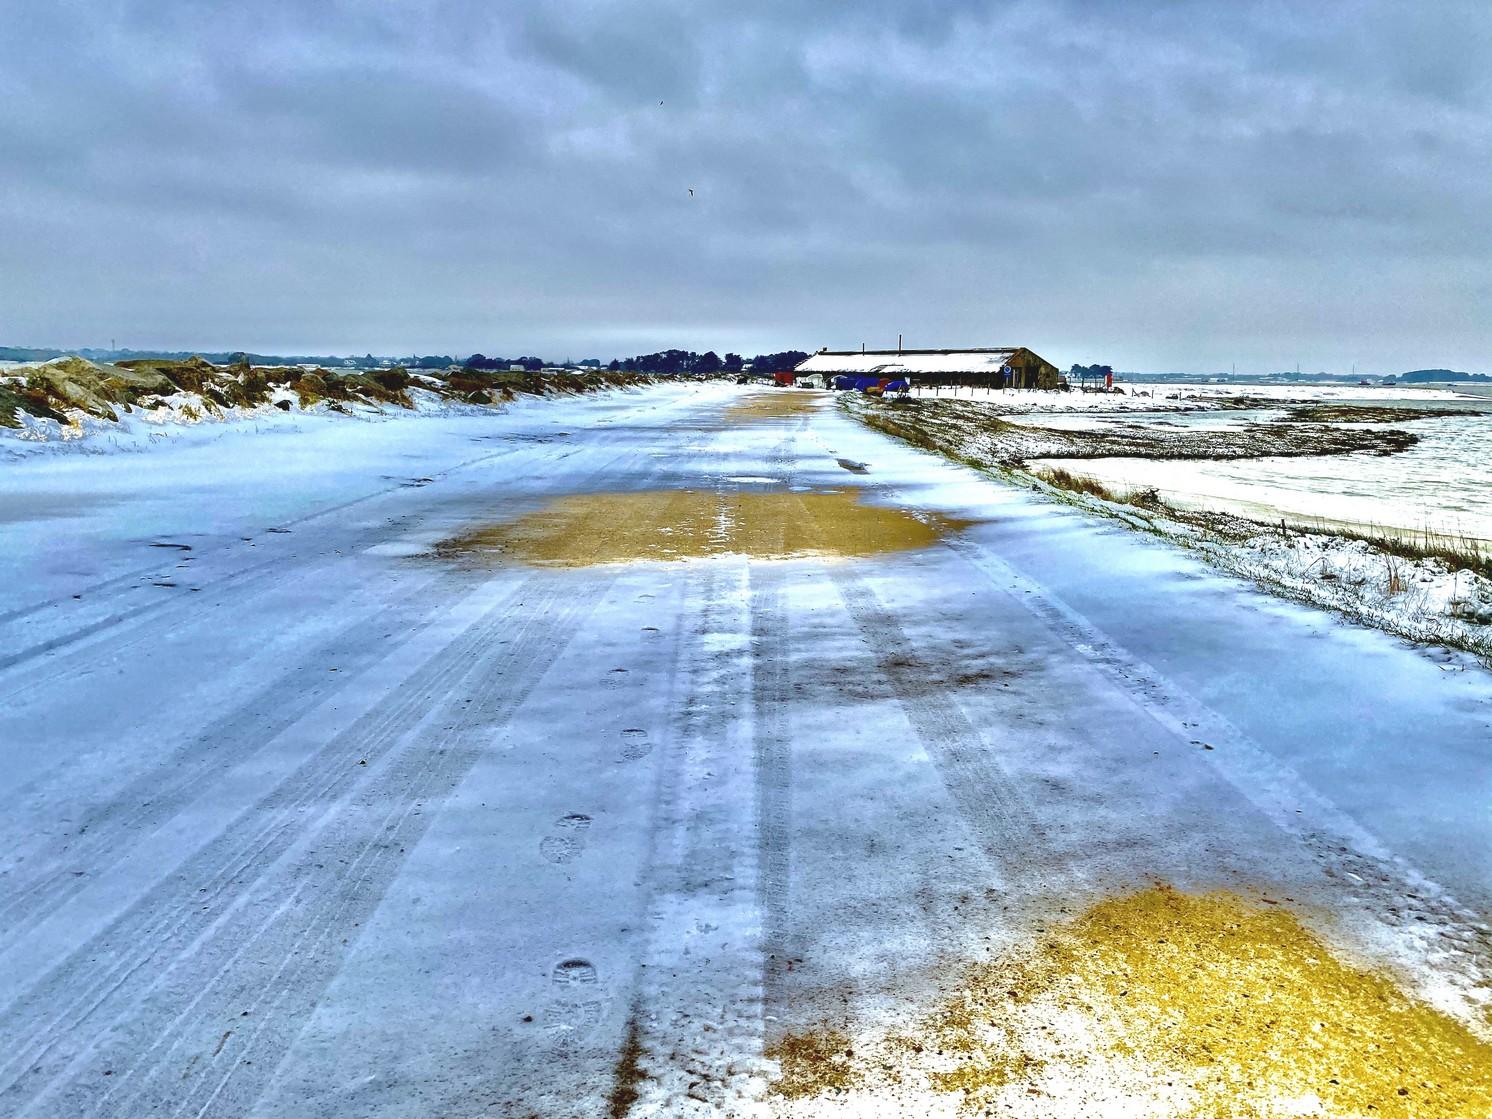 Penerf en Damgan sous la neige - morbihan bretagne©Philippe Jaquemin (5)